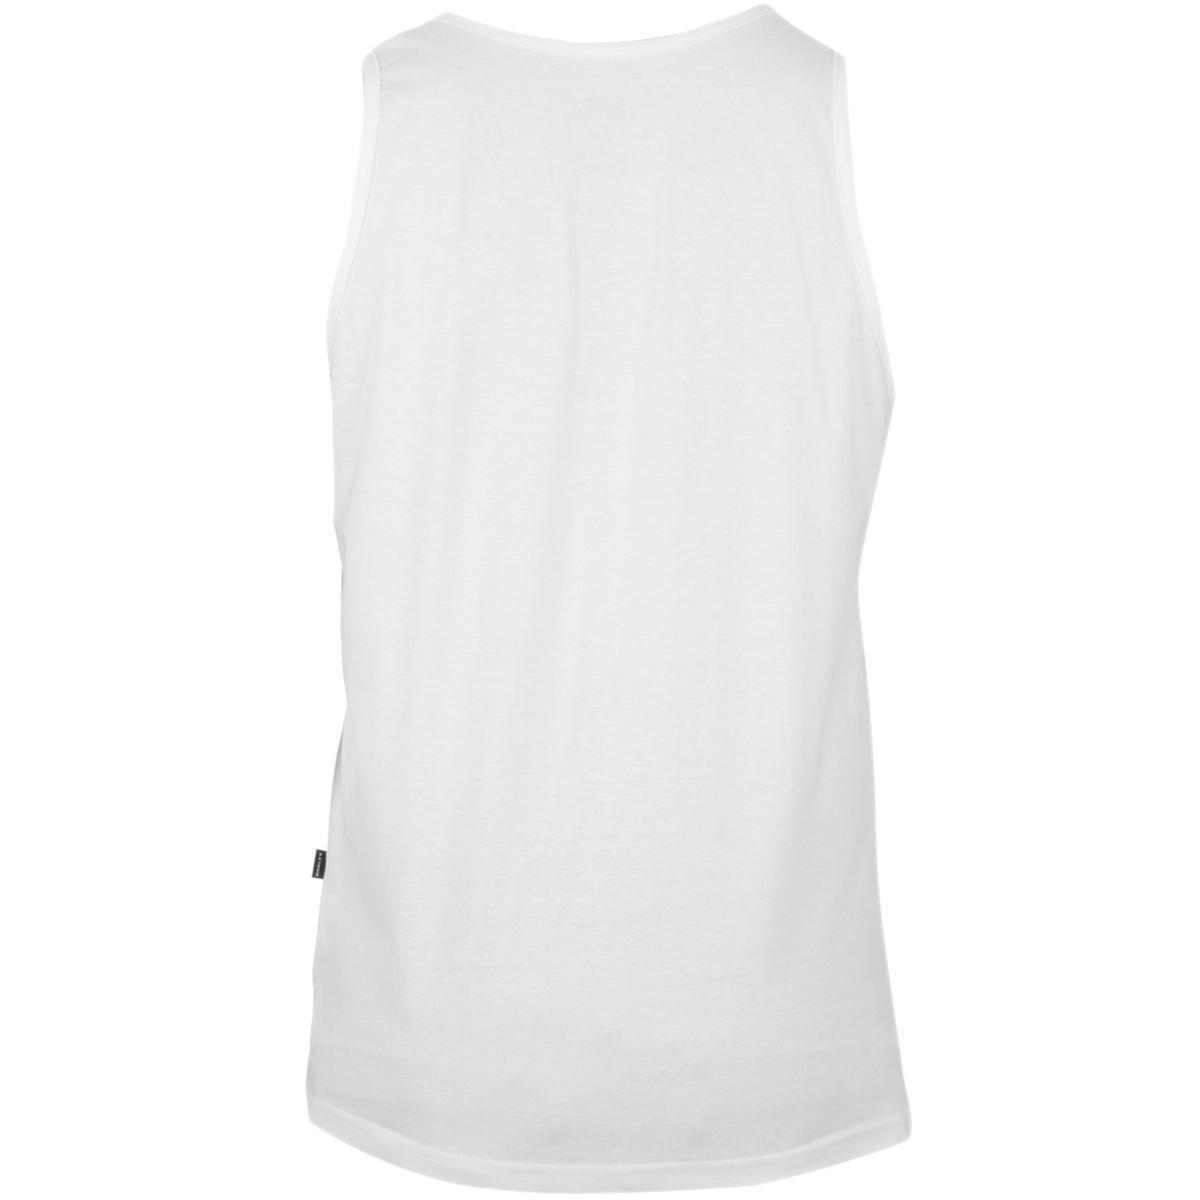 Camiseta Oakley Tank Panel Elipse Masculino - Compre Agora  85cdc726ff1